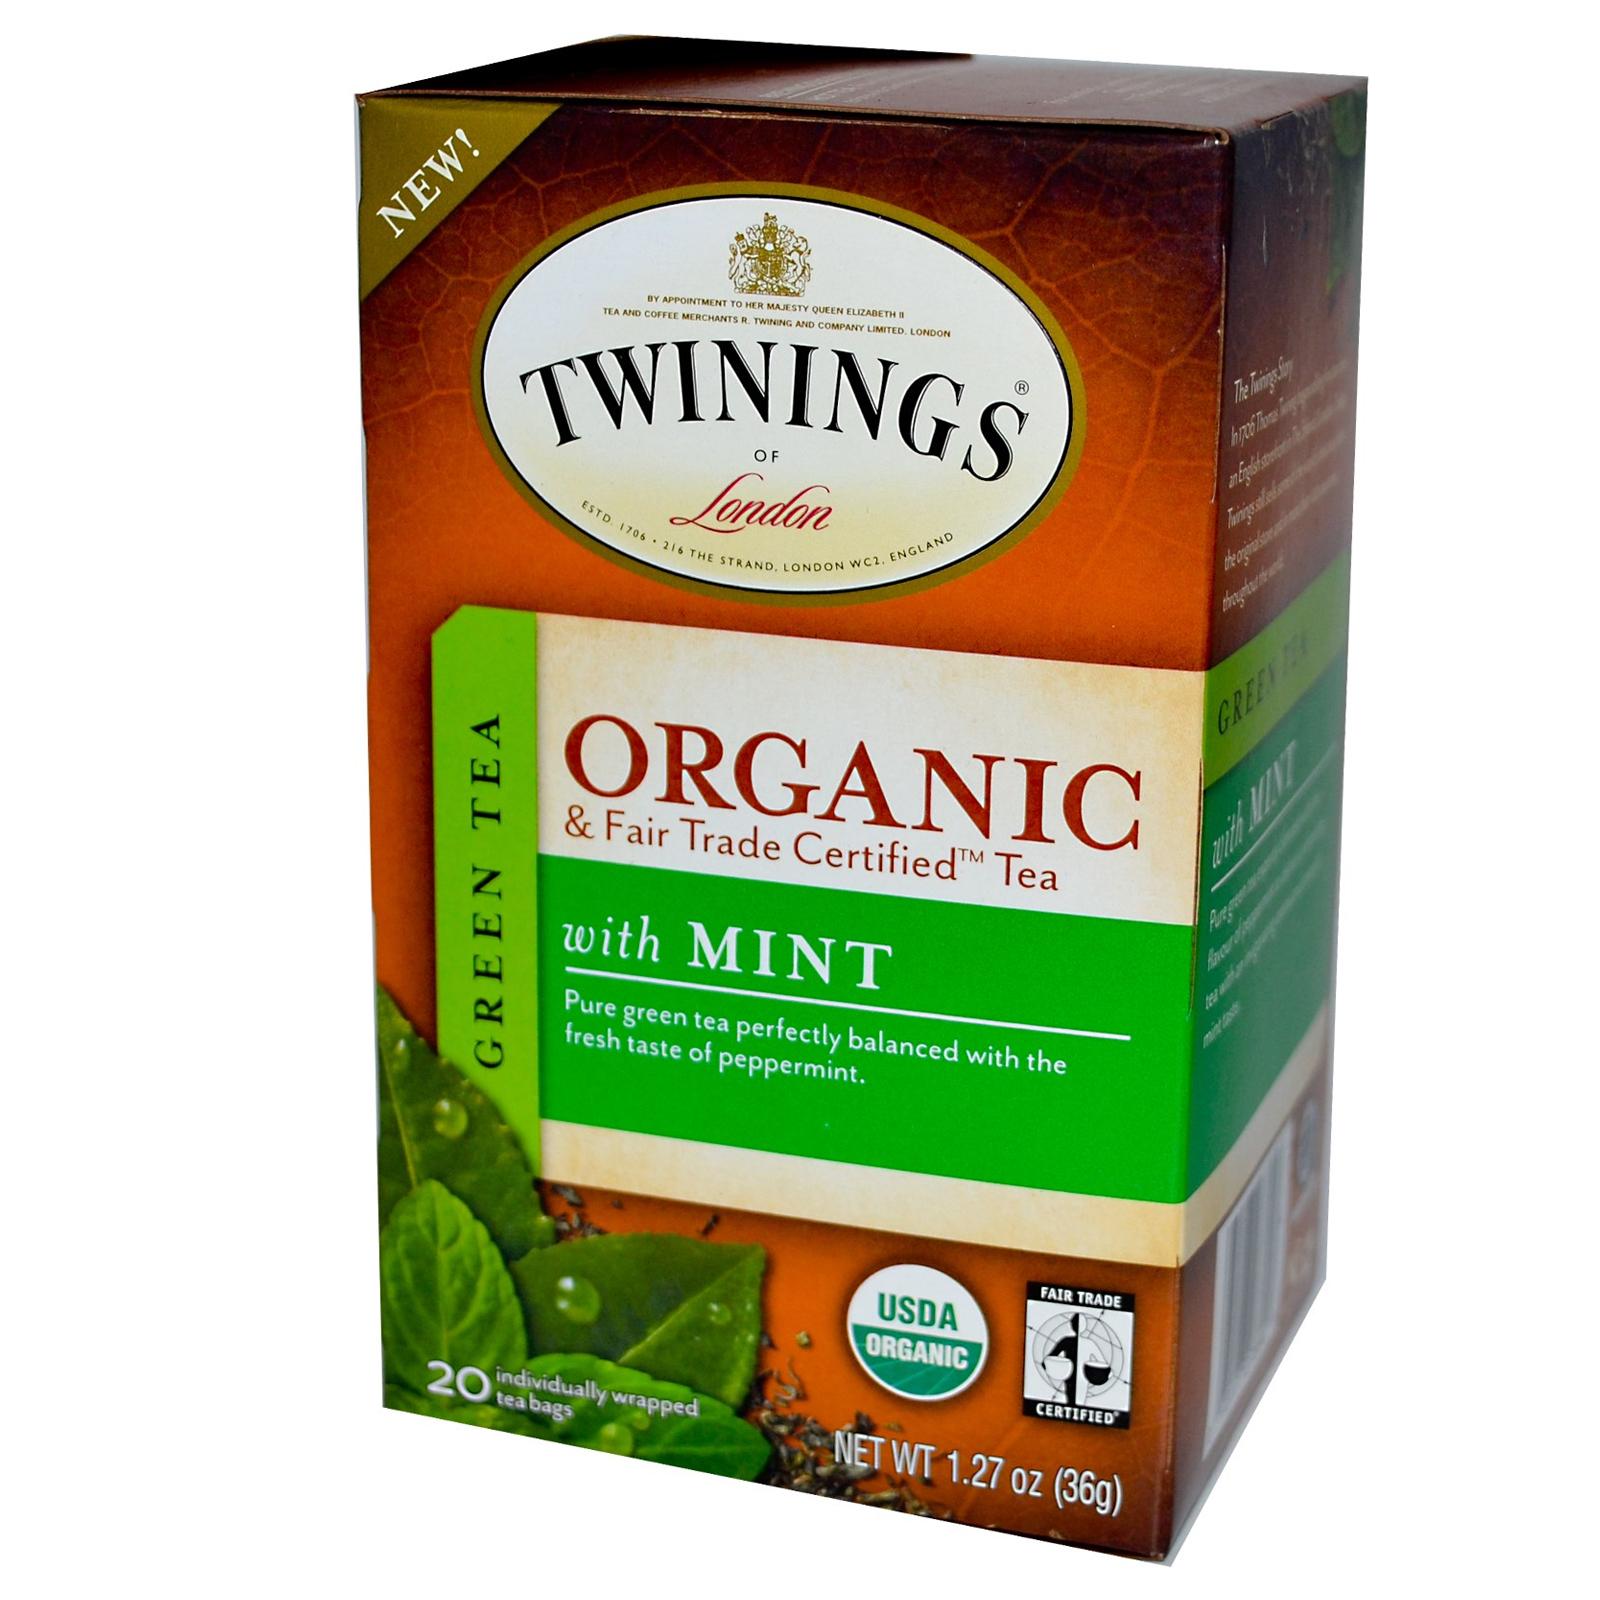 Mint Green Organic Tea Bags From Twinings